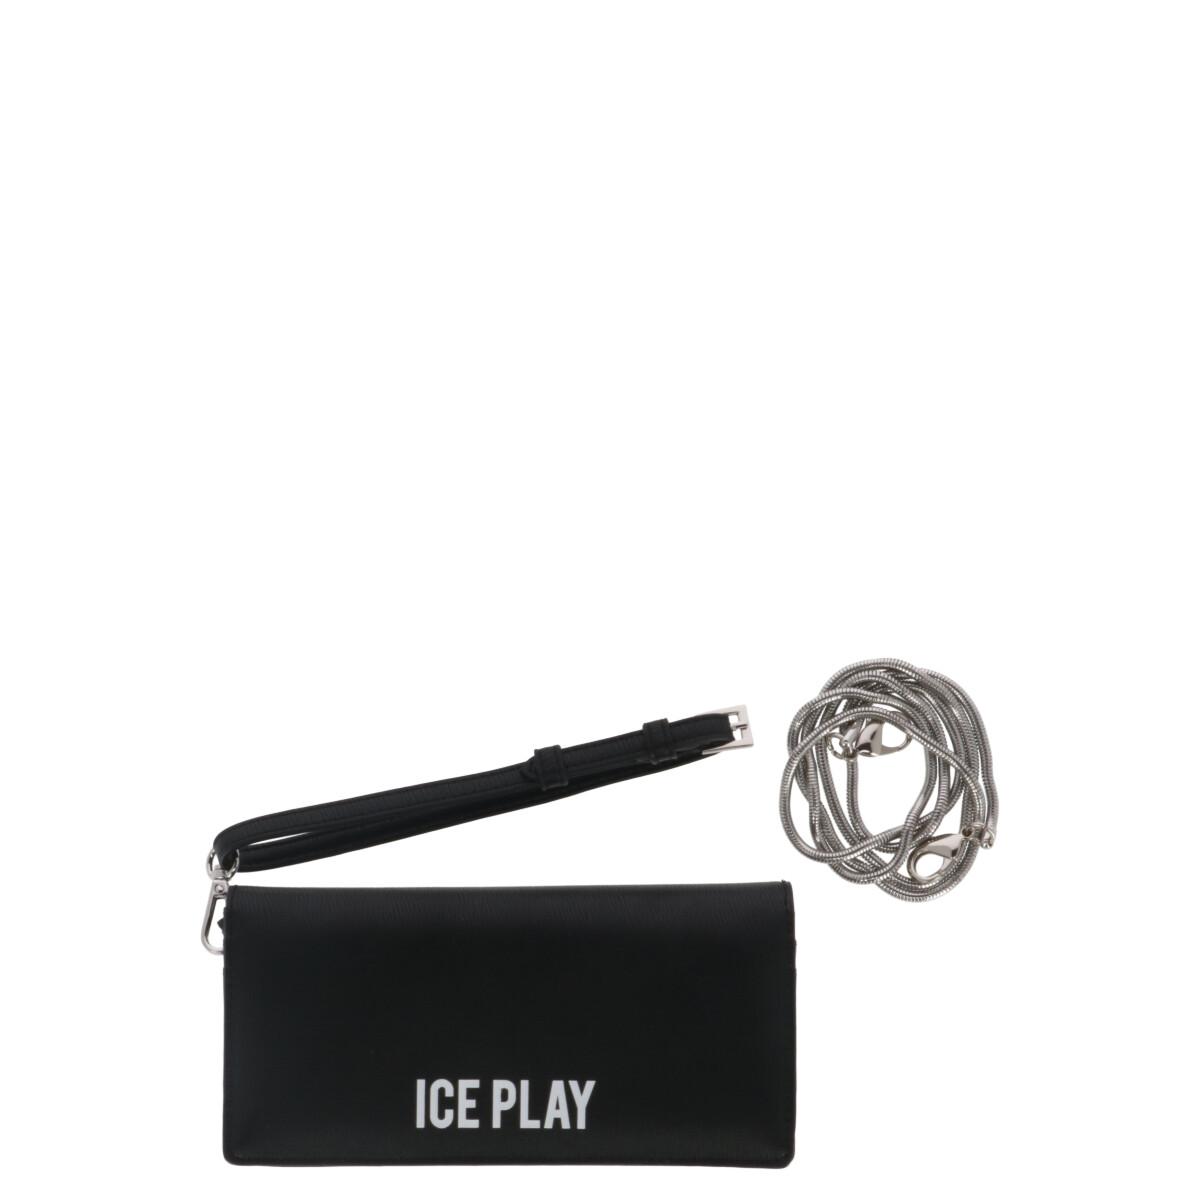 Ice Play Portafogli Donna